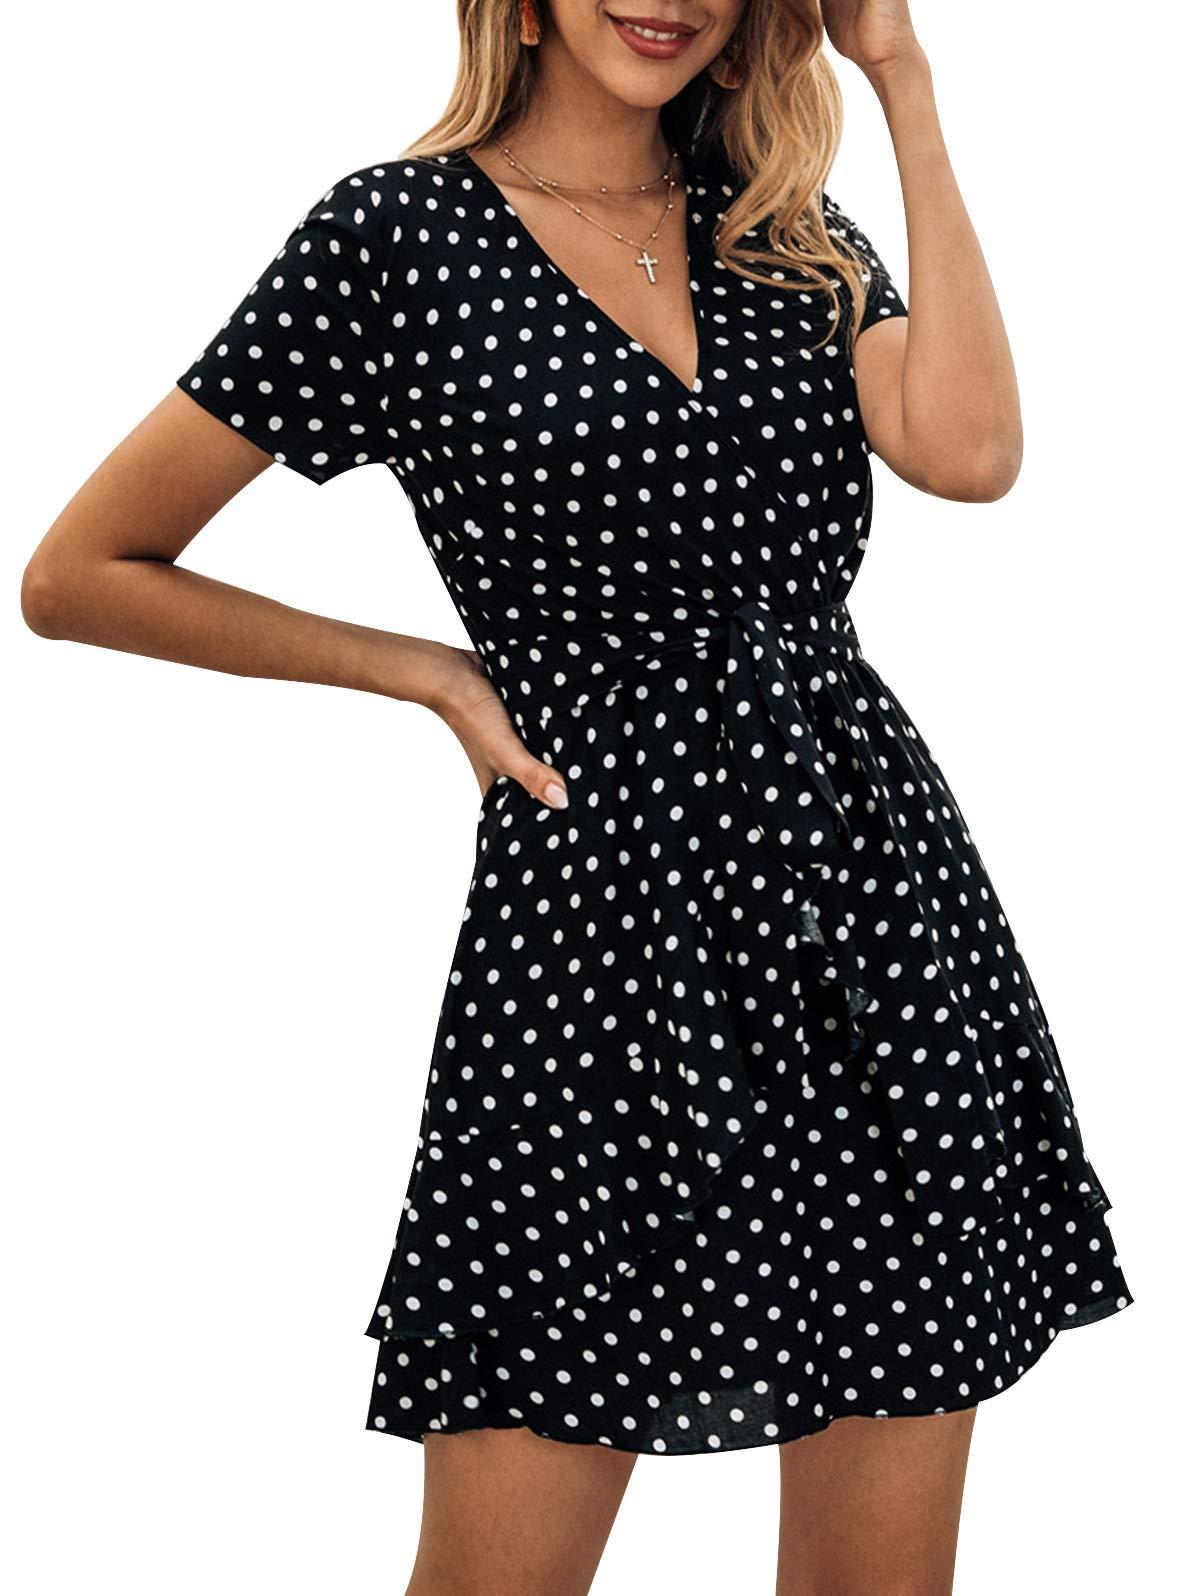 SHIBEVER Womens Summer Dresses Casual for Women Sundress Bohemian Boho Wrap Dress Women Striped Dress V Neck Classic Party Swing Dress Black-2 XL